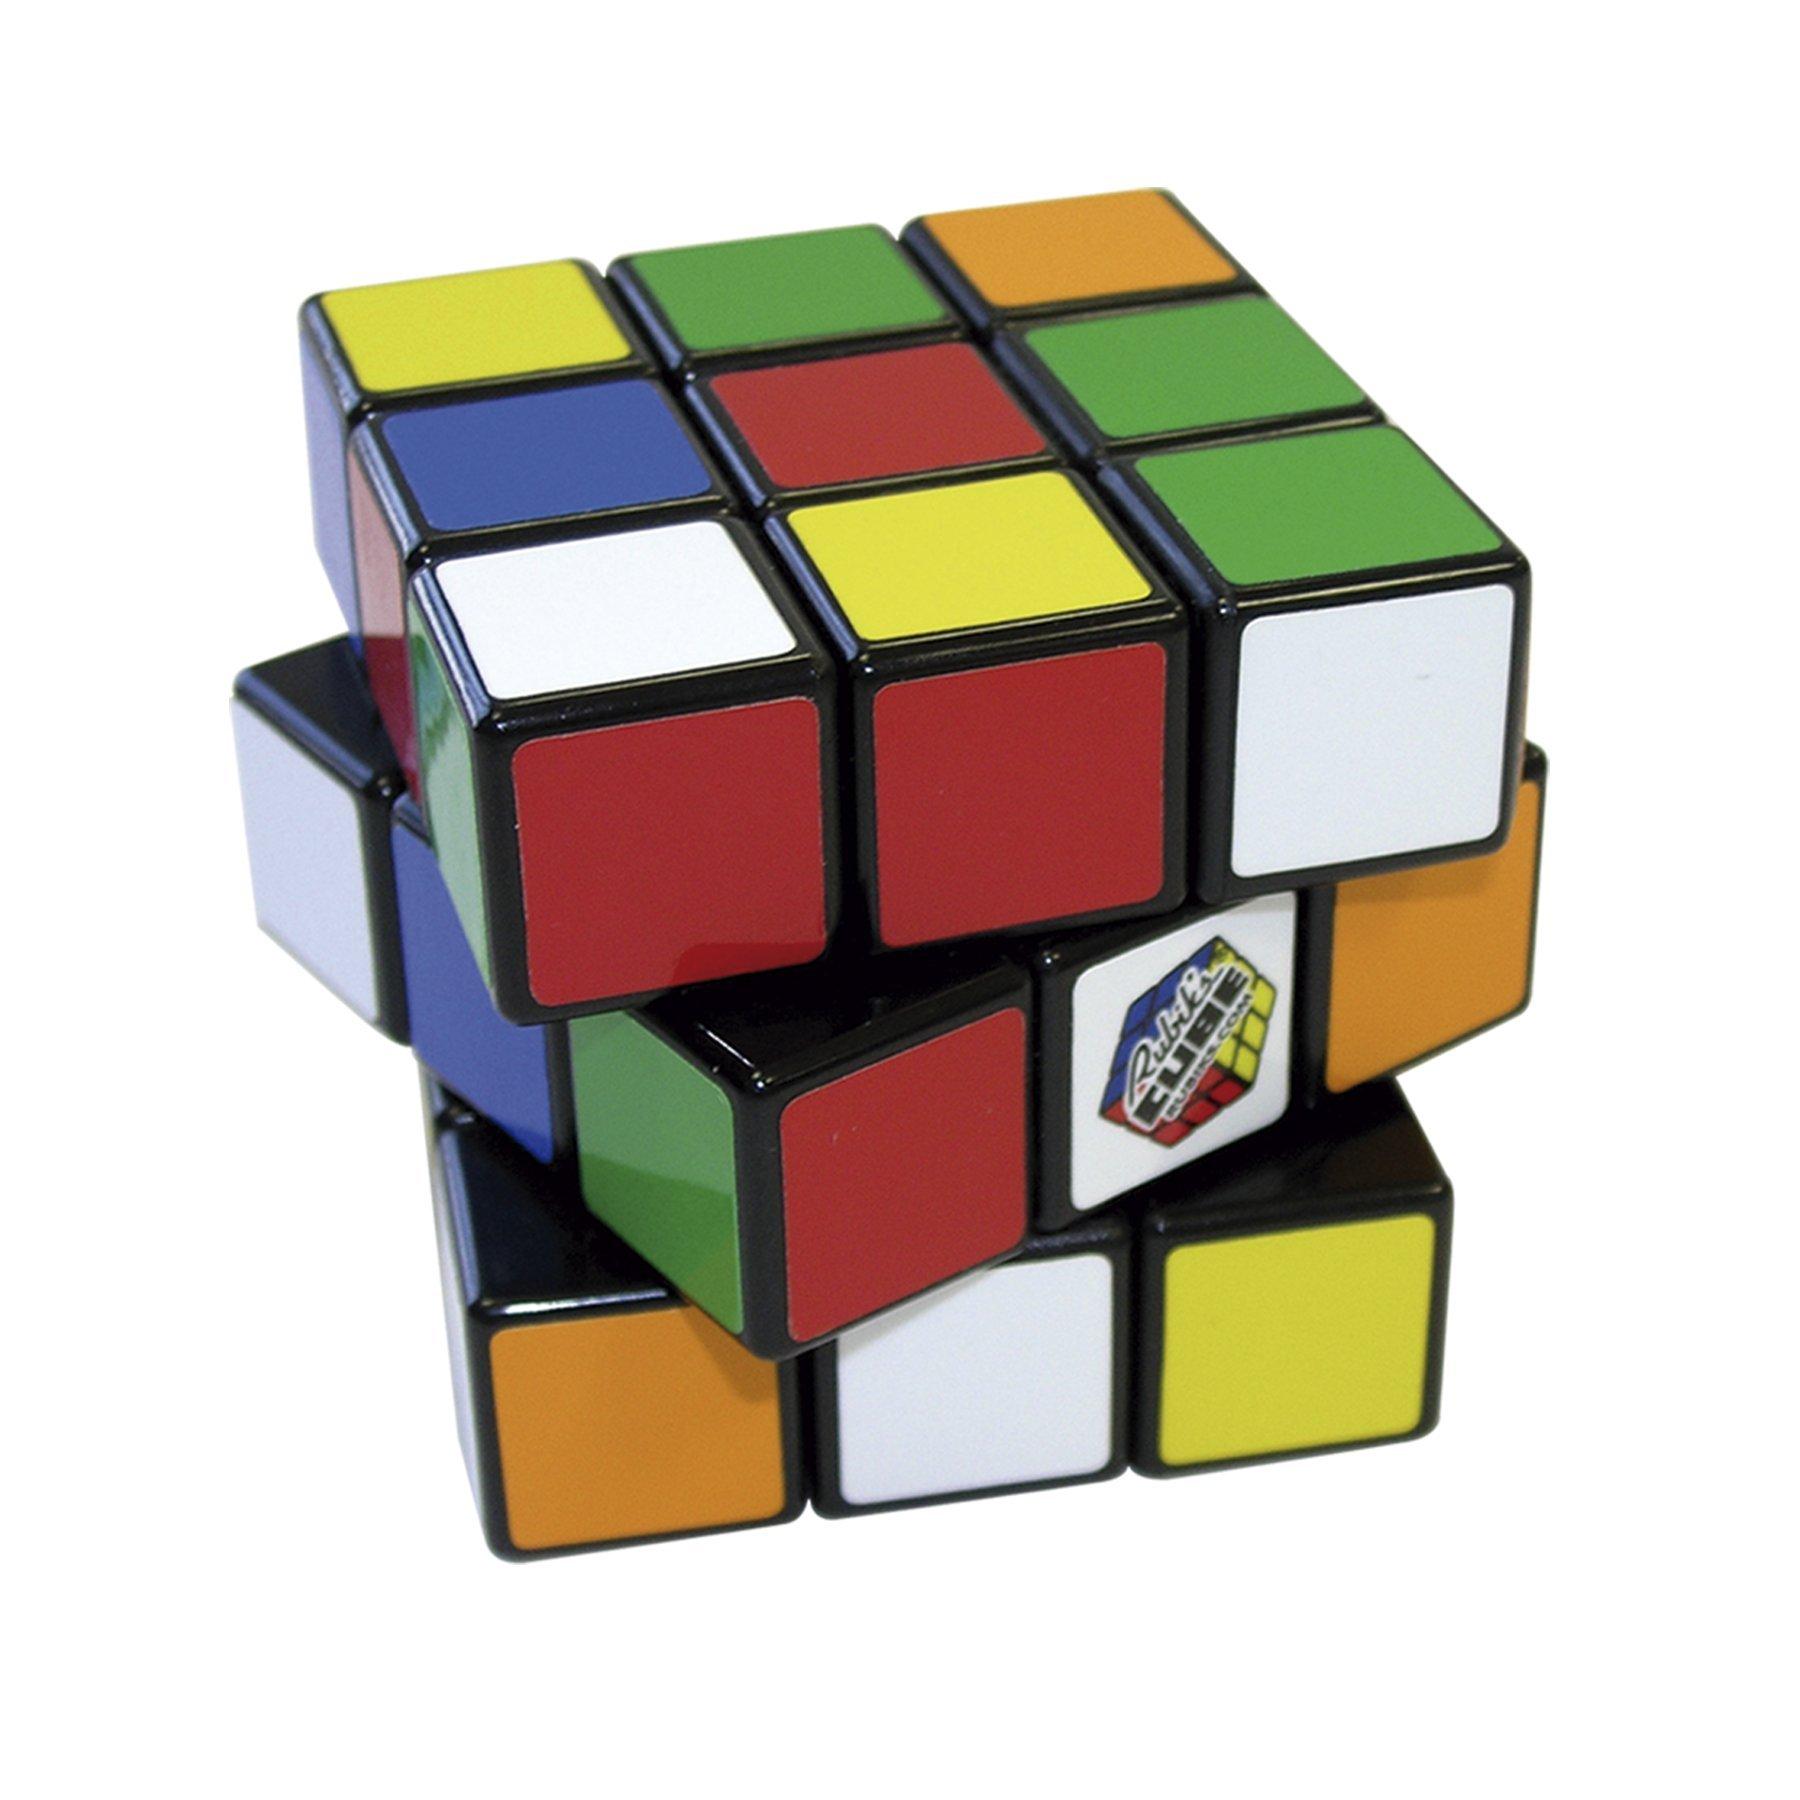 Comprar Goliath - Cubo de Rubiks 3X3 Original, 6 colores (72101)